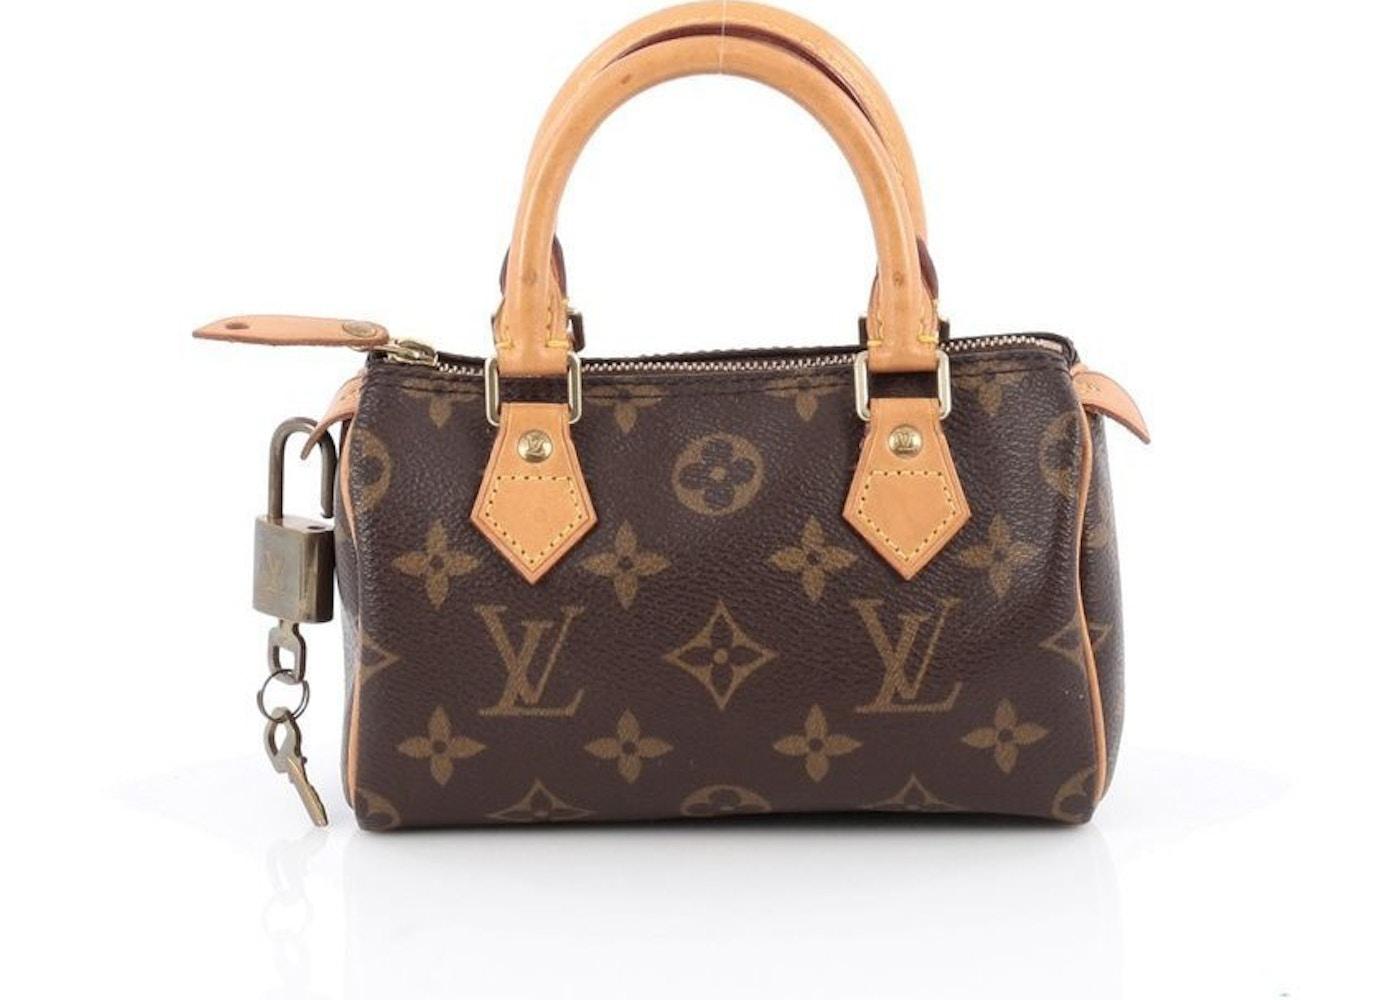 952cec56f875 Sell. or Ask. View All Bids. Louis Vuitton Speedy Hl Monogram Mini Brown